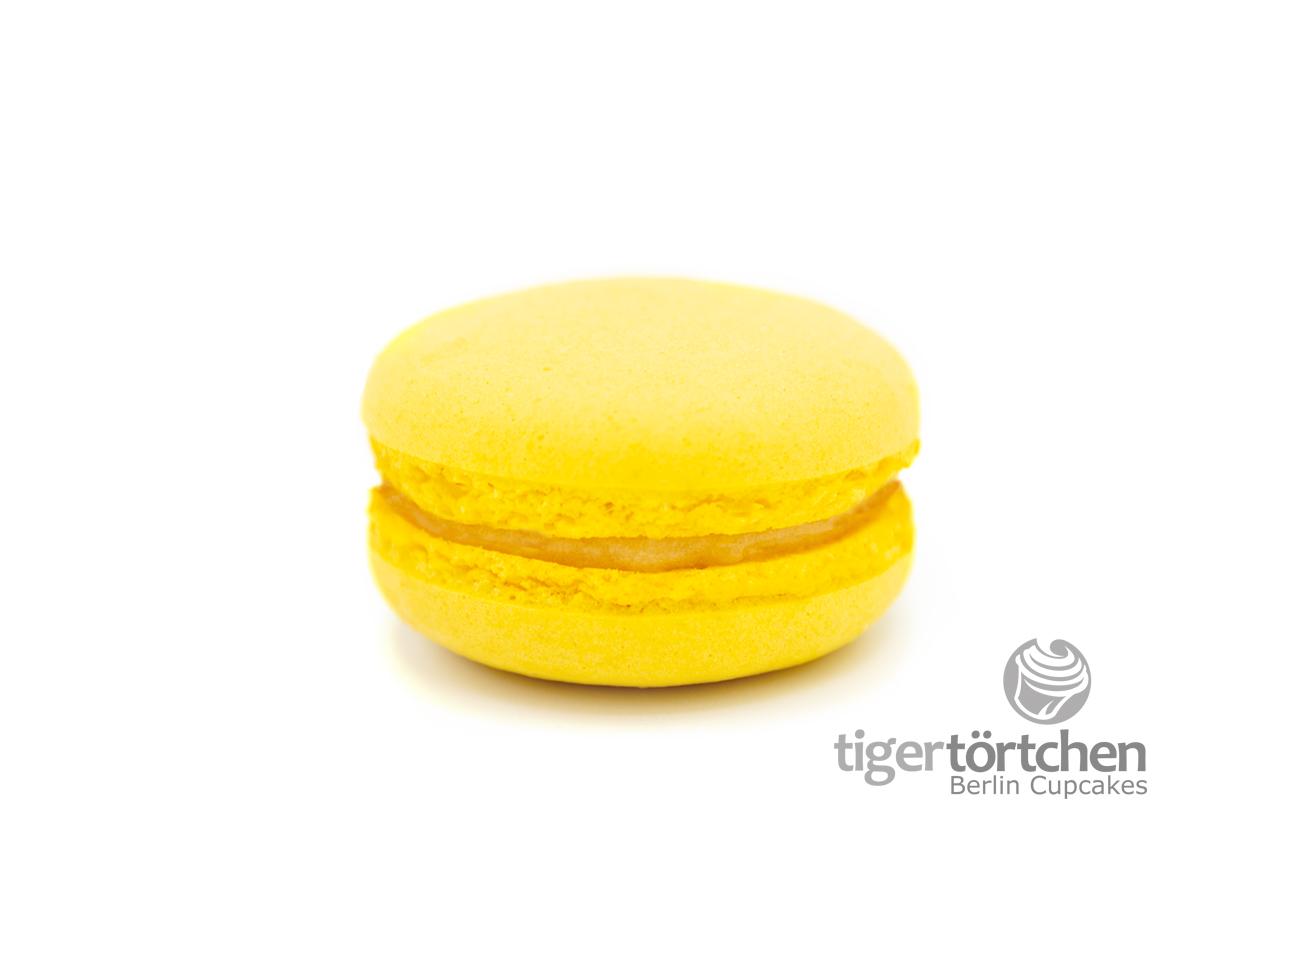 Macaron Zitrone-Basilikum tigertörtchen Berlin